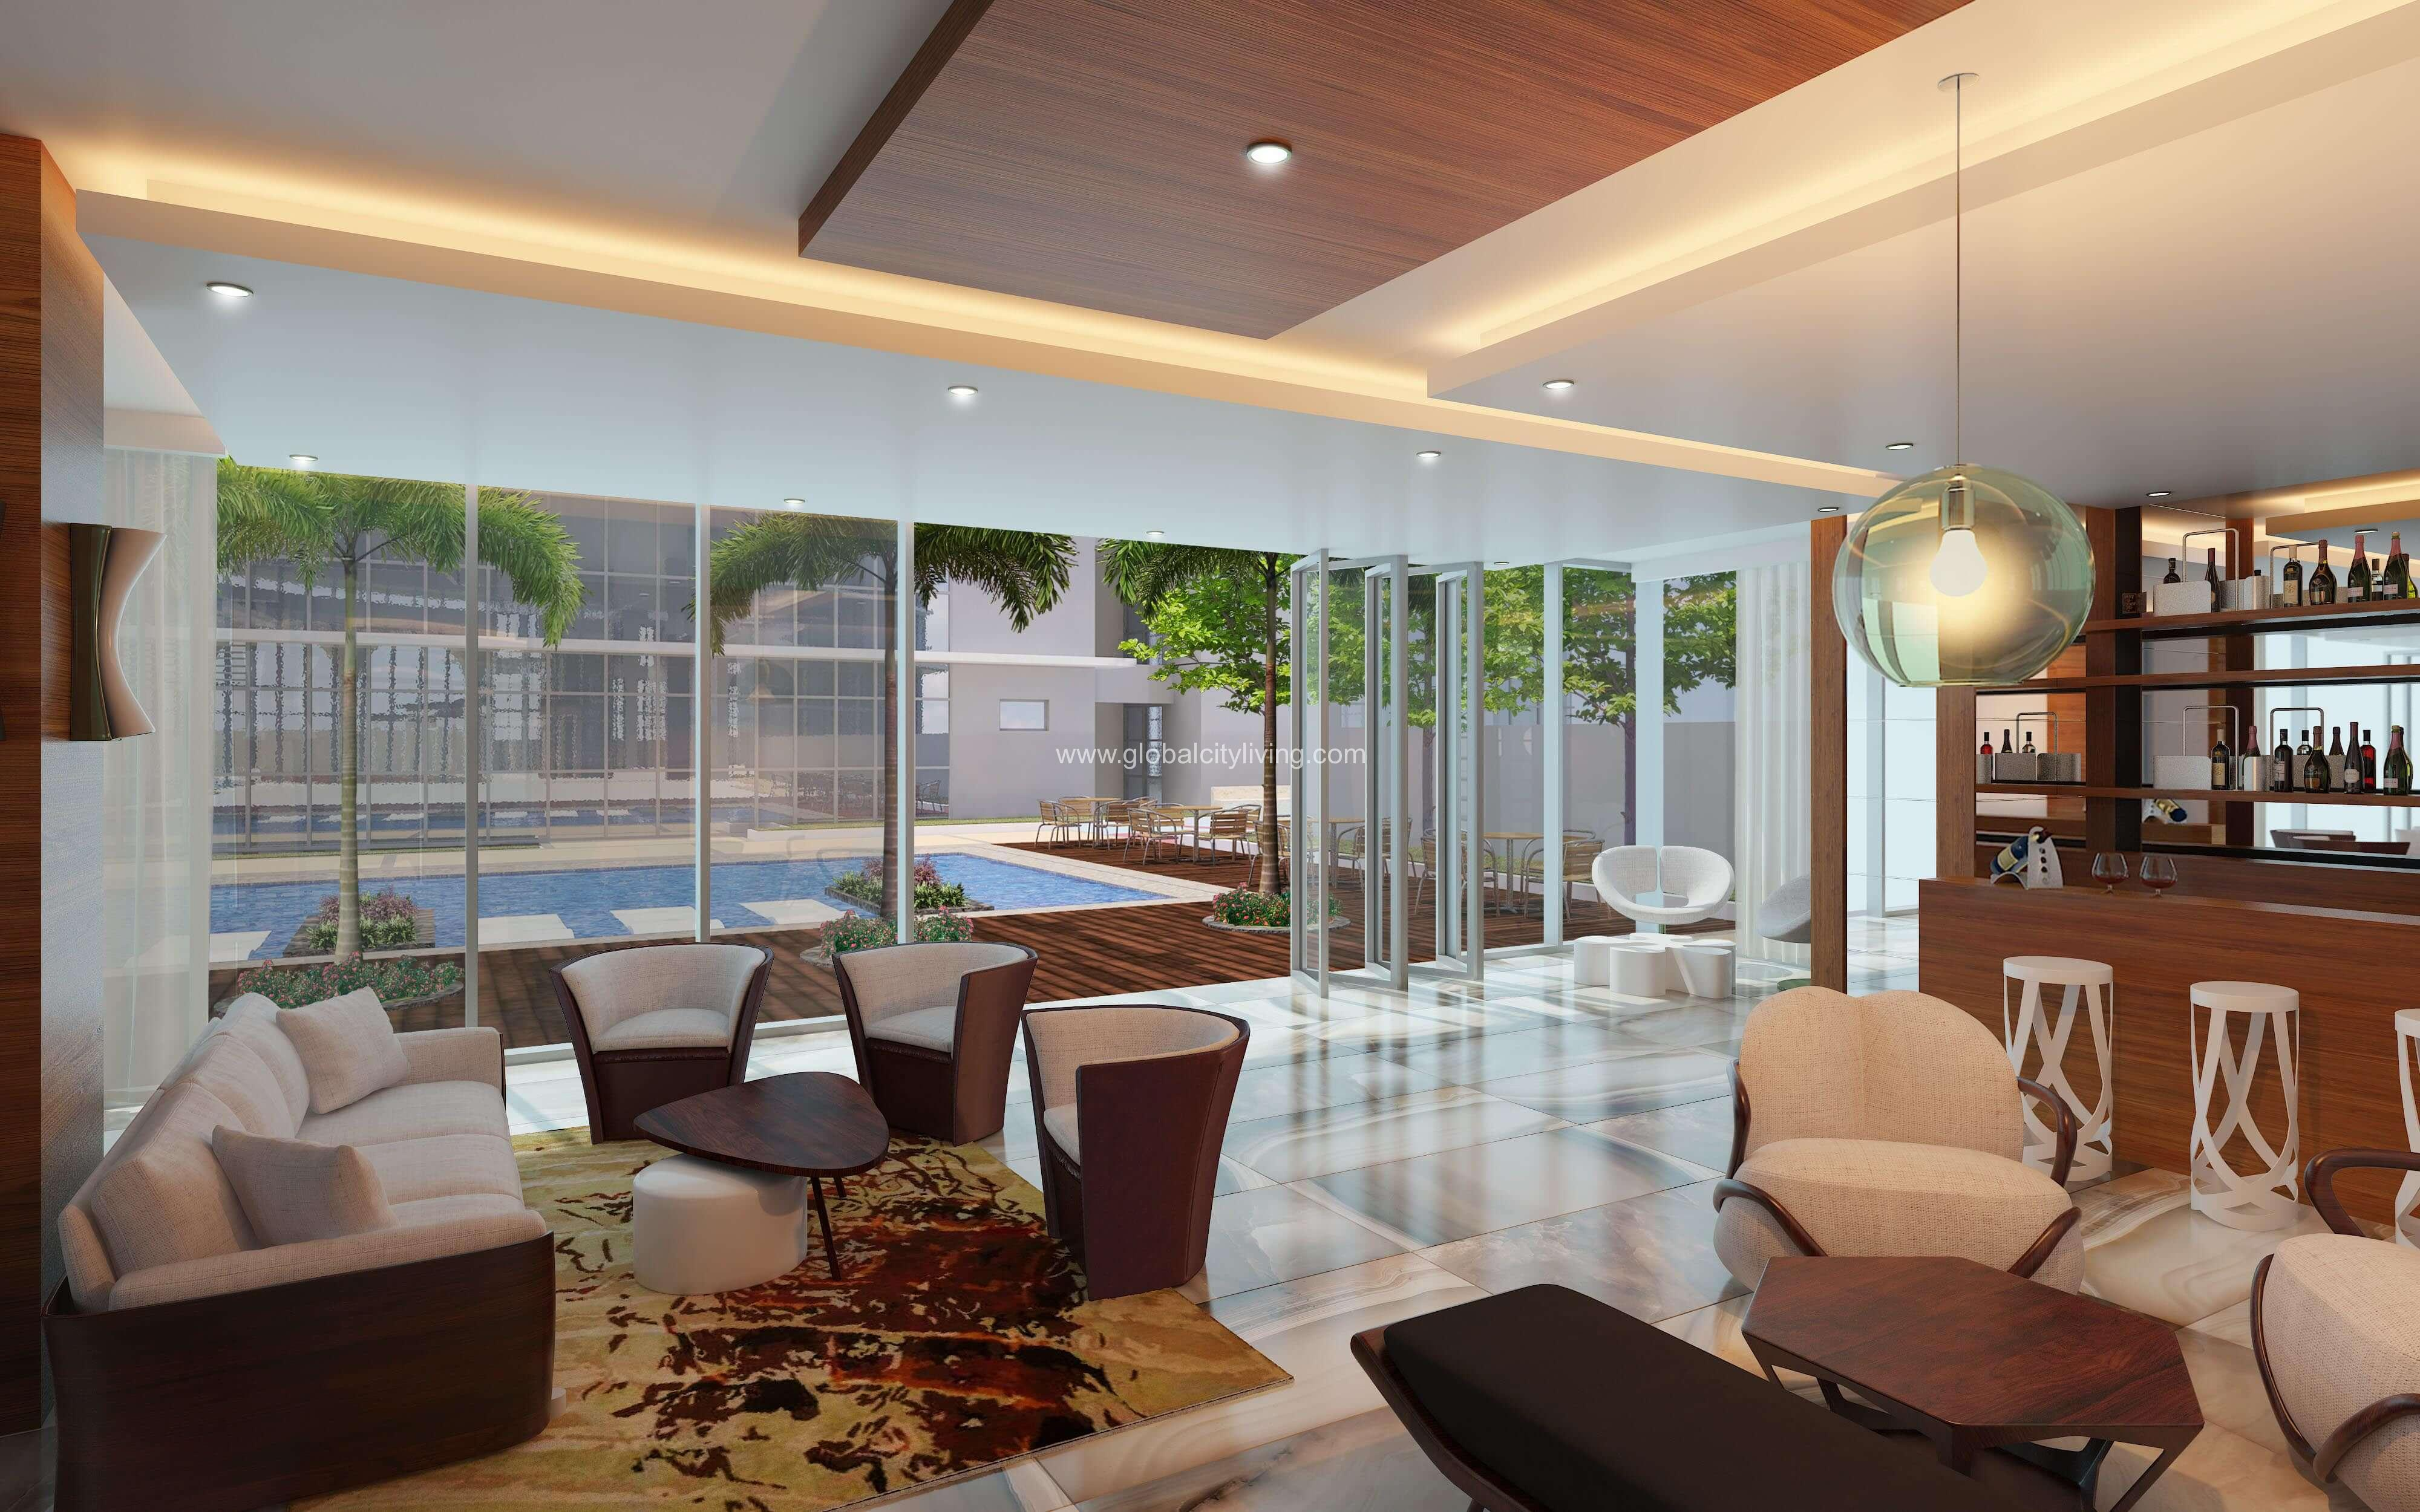 Lovely Suite BGC Center near Burgos Circle   WiFi Manila Philippines